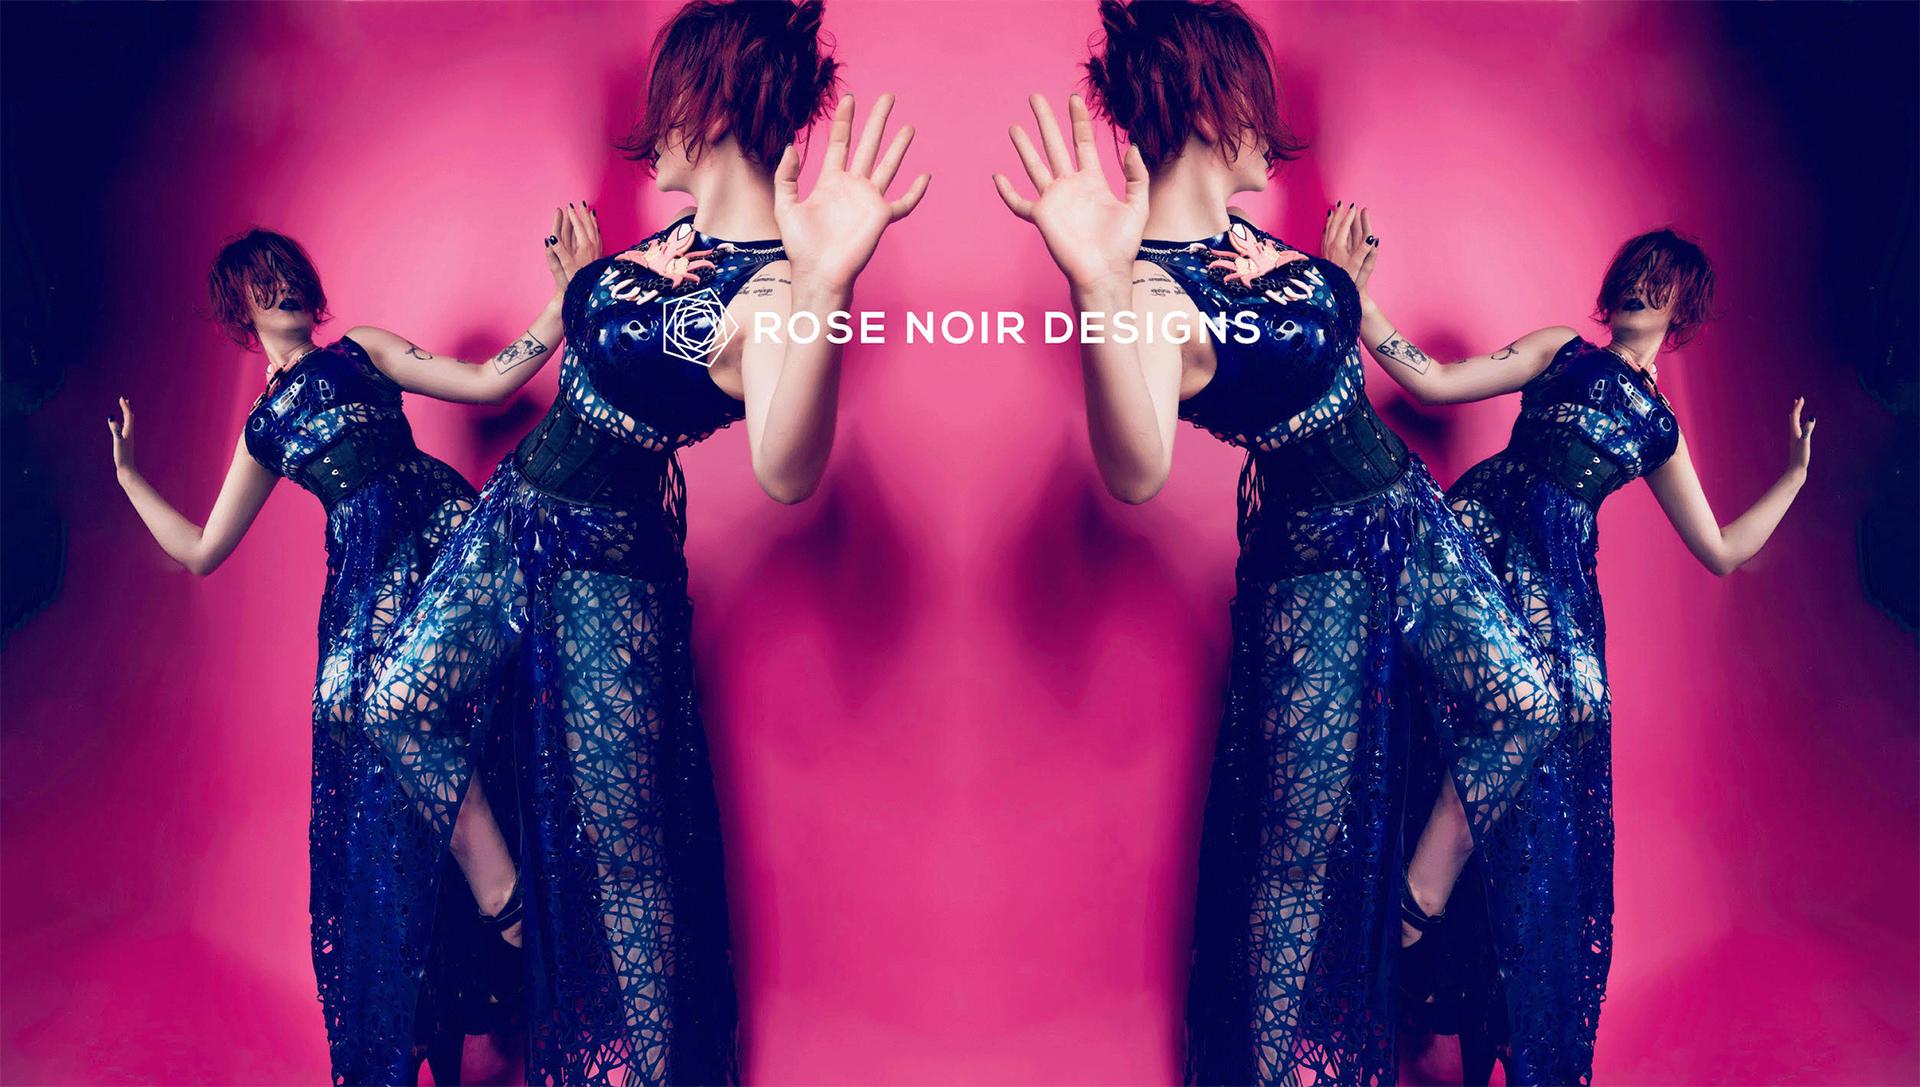 Rose Noir Designs